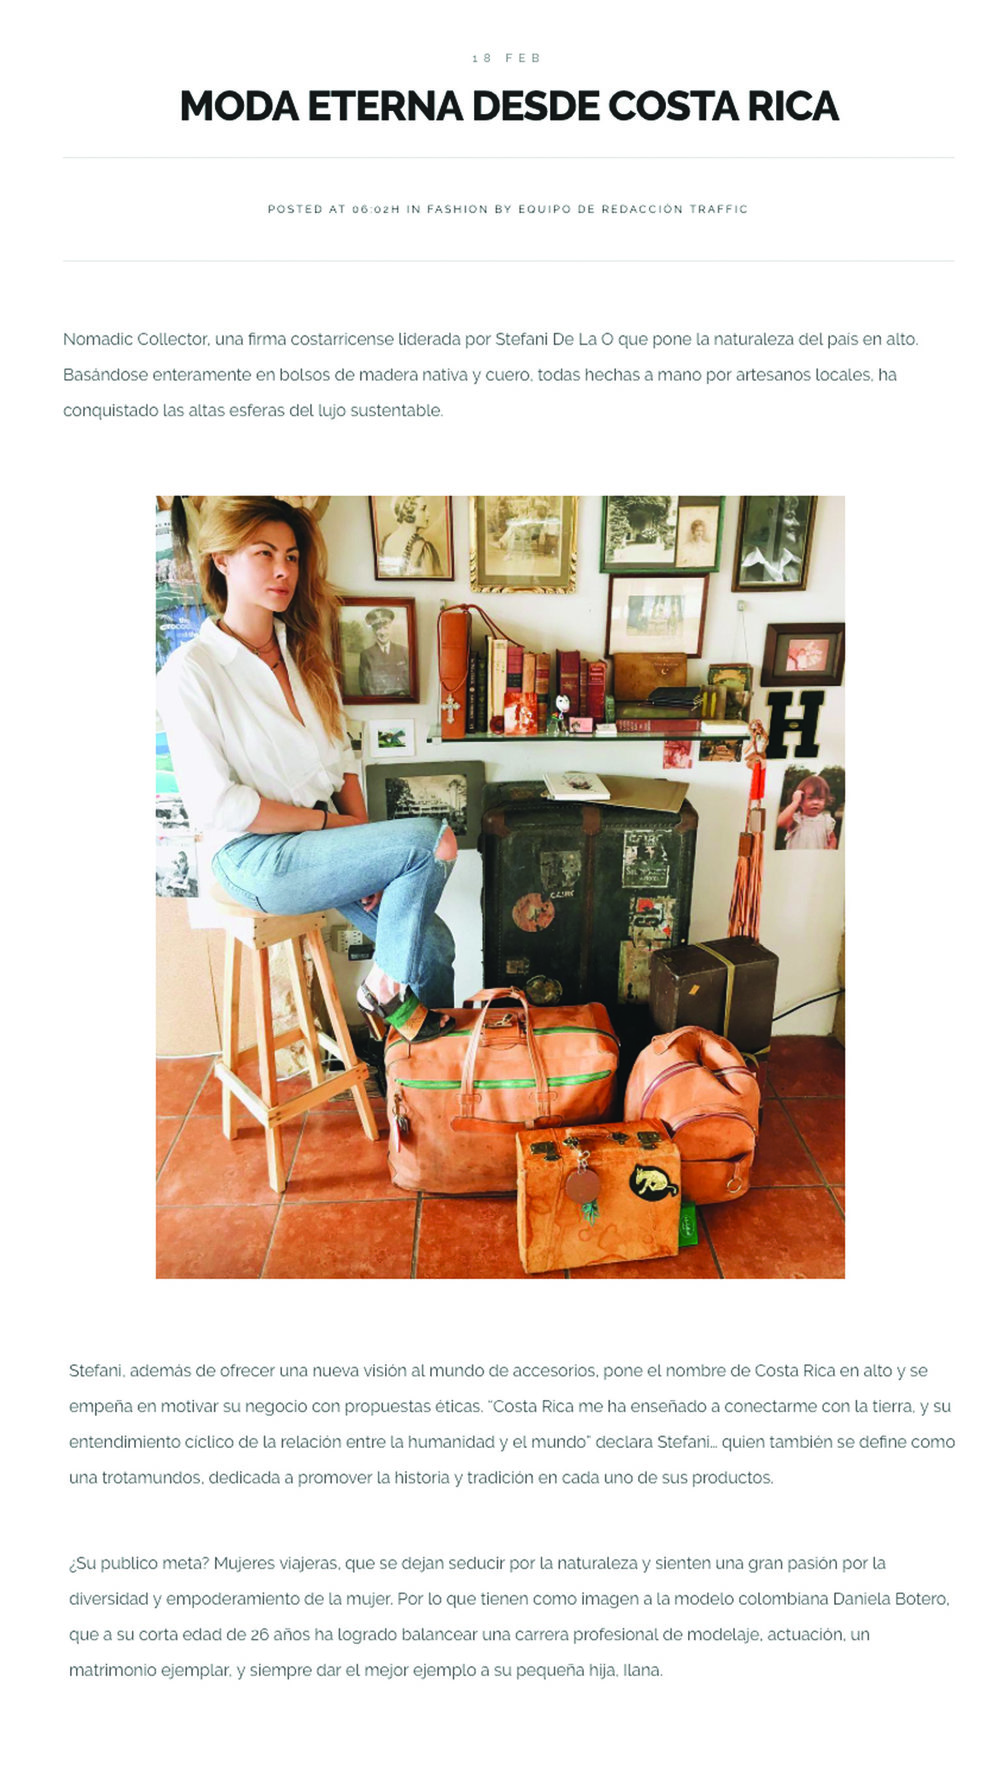 Traffic Magazine _ Moda eterna desde costa rica